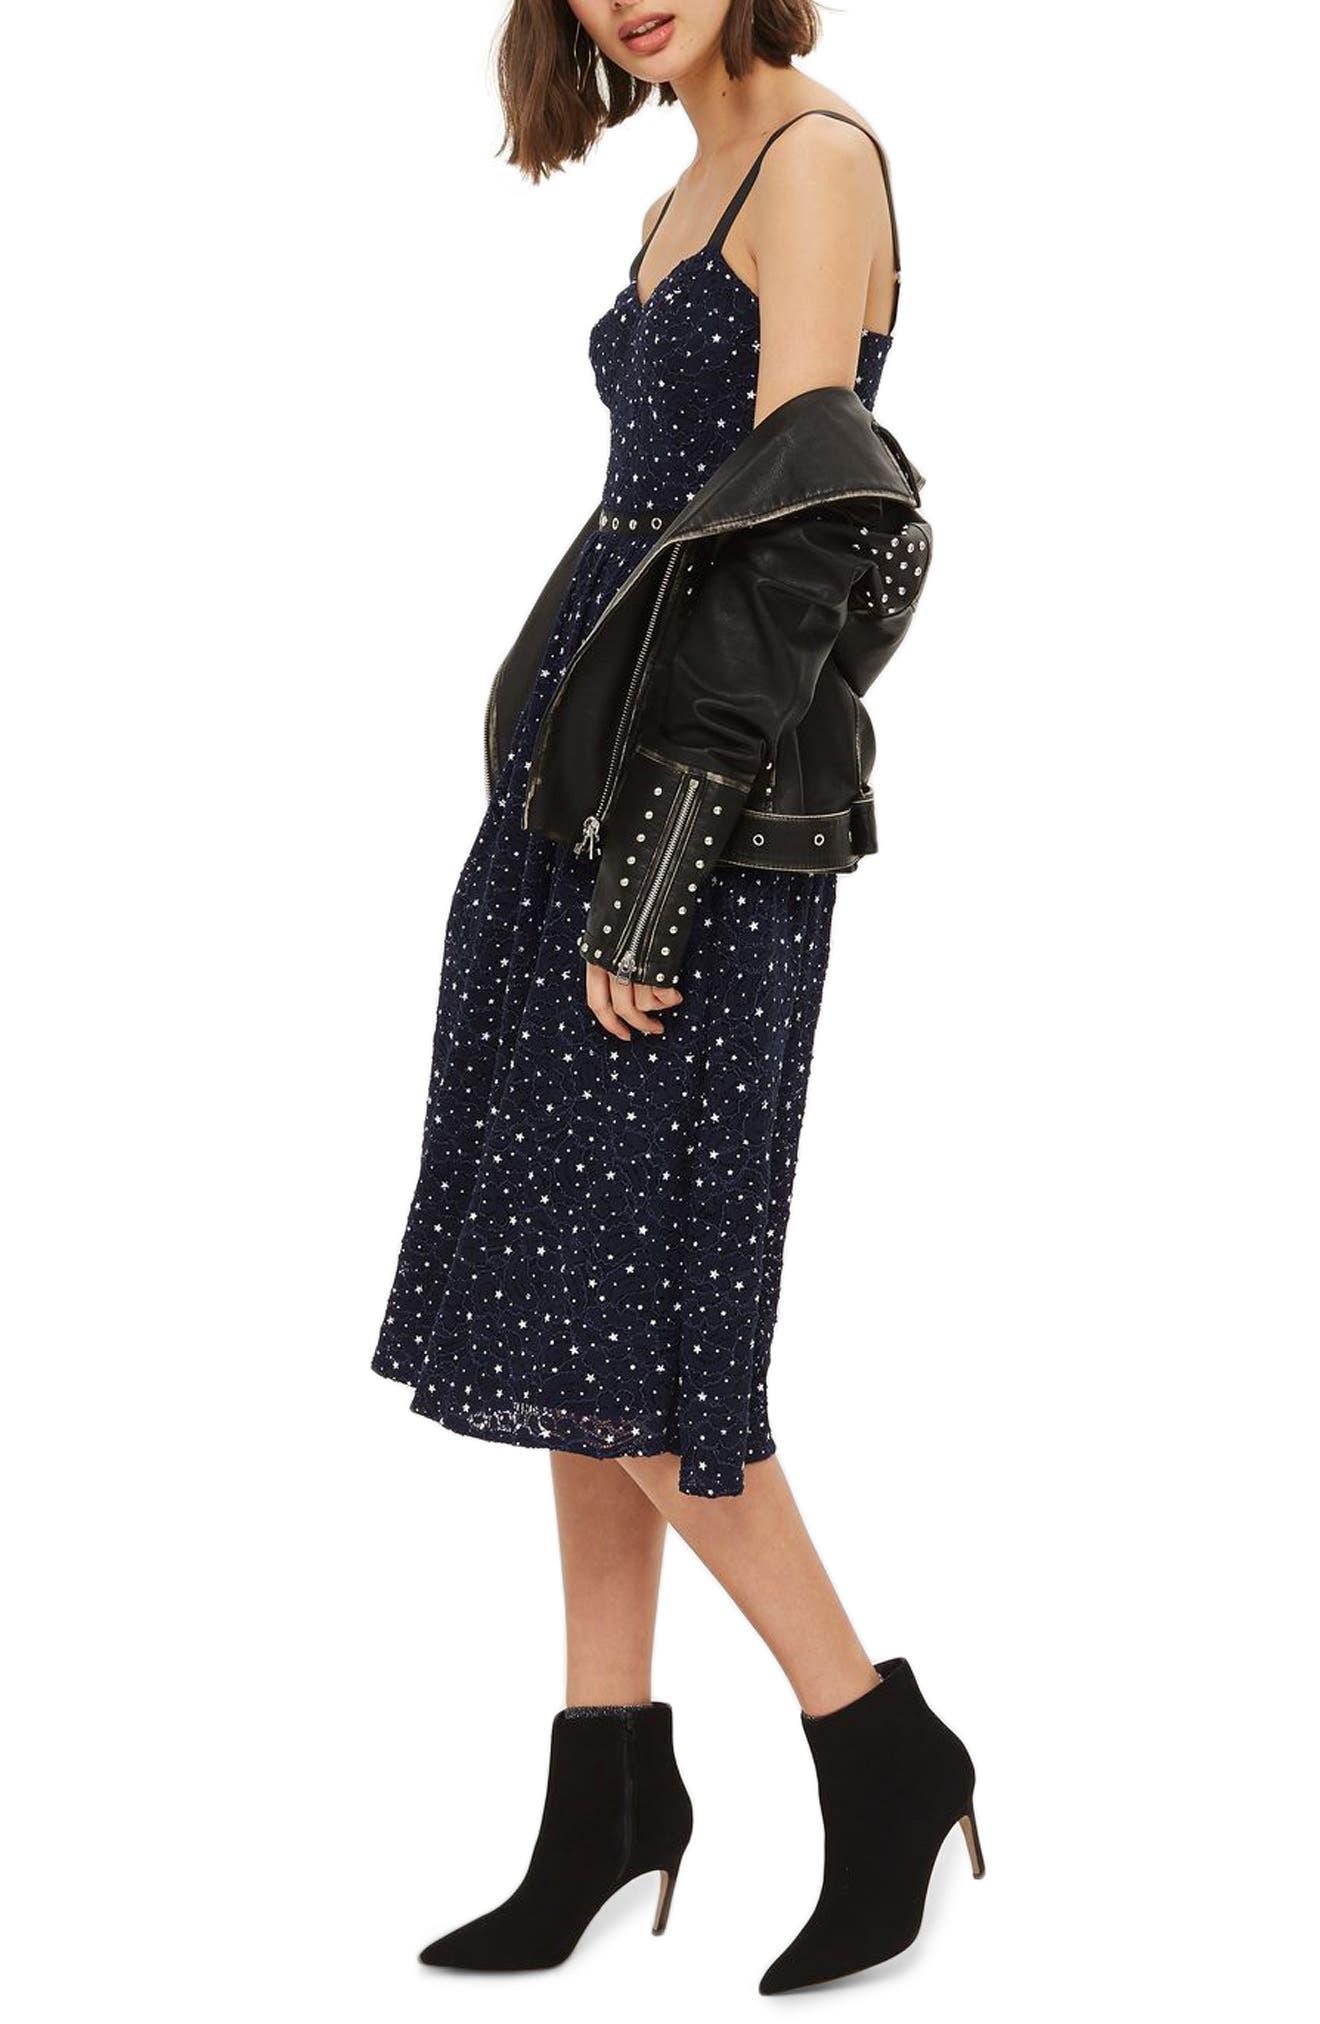 Star Lace Bustier Midi Dress,                         Main,                         color, Navy Blue Multi